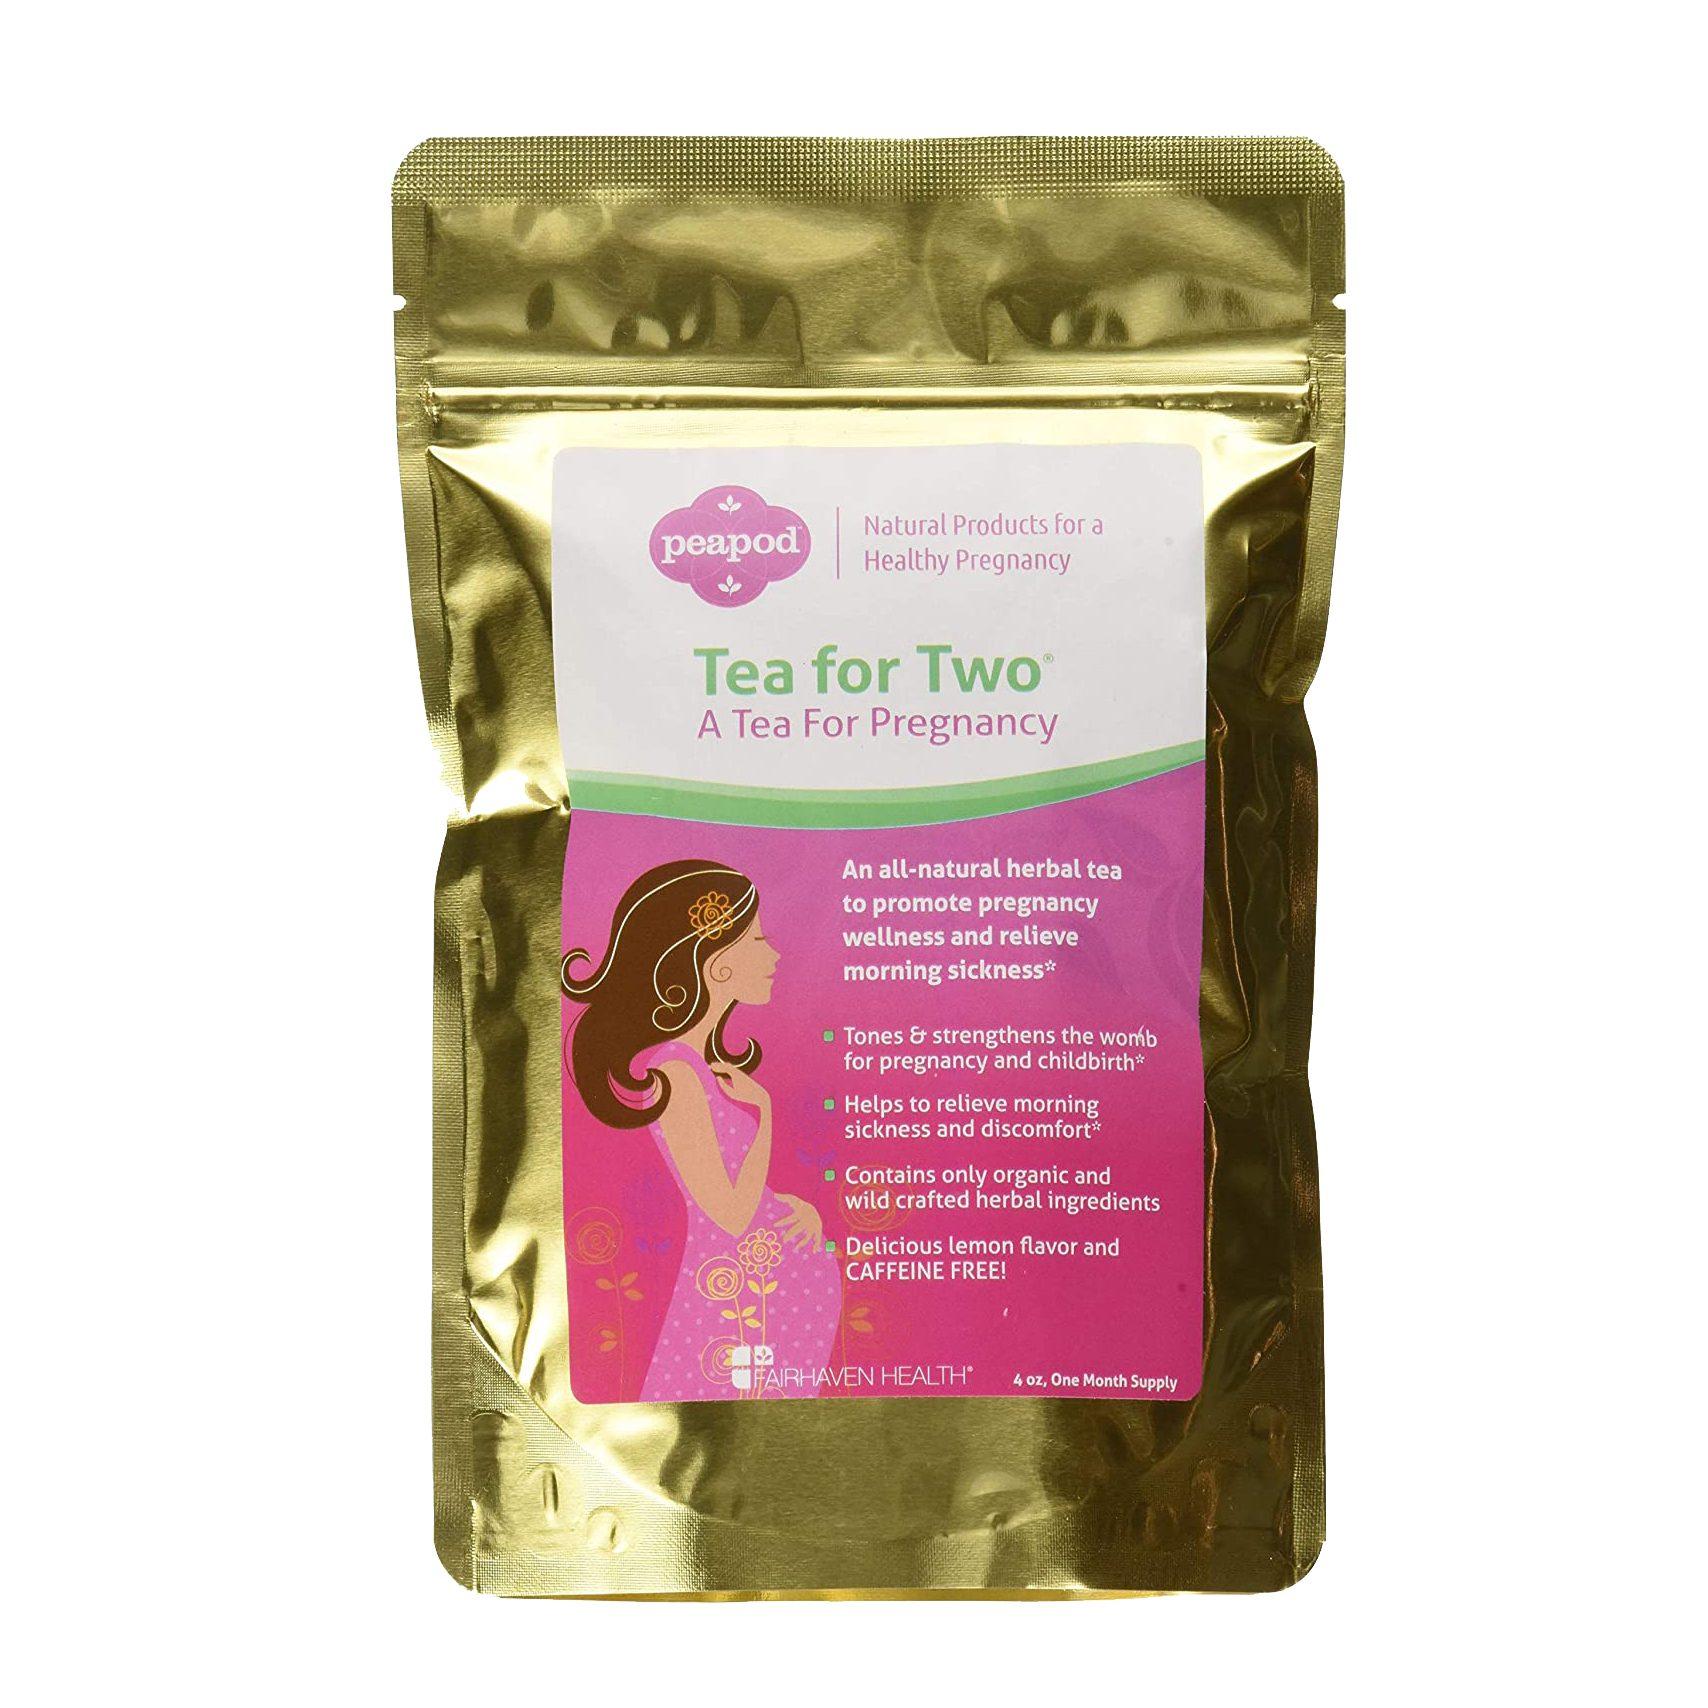 Fairhaven Health's Tea-for-Two Pregnancy Tea